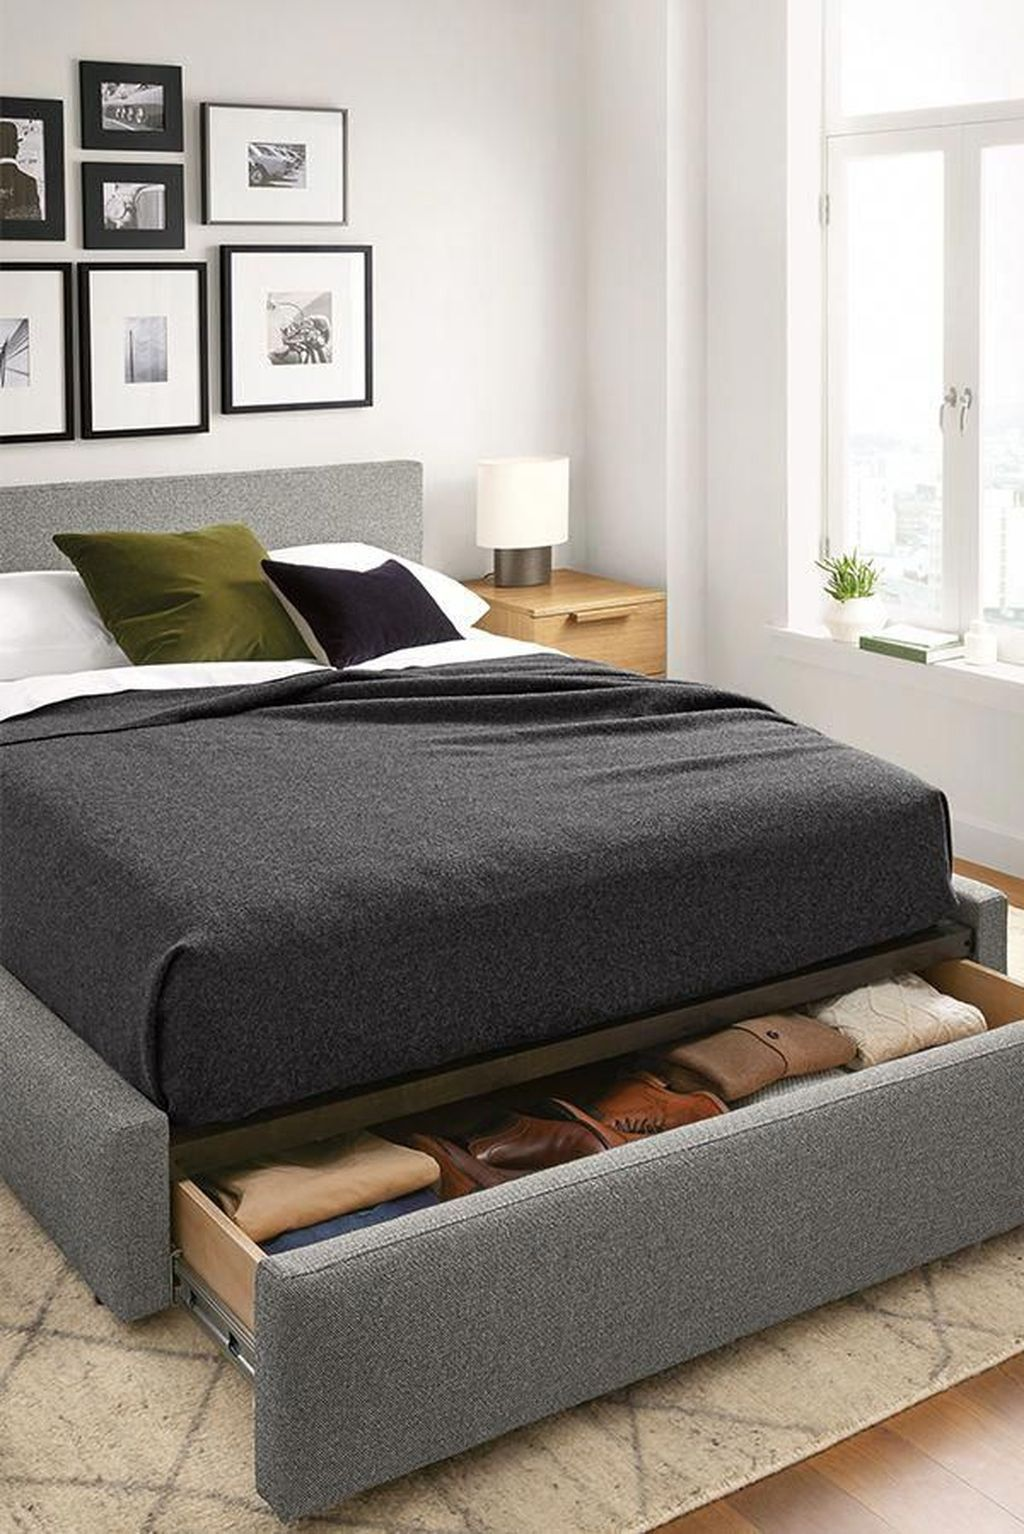 31 Wonderful Hidden Bedroom Storage Design Ideas For Small Space